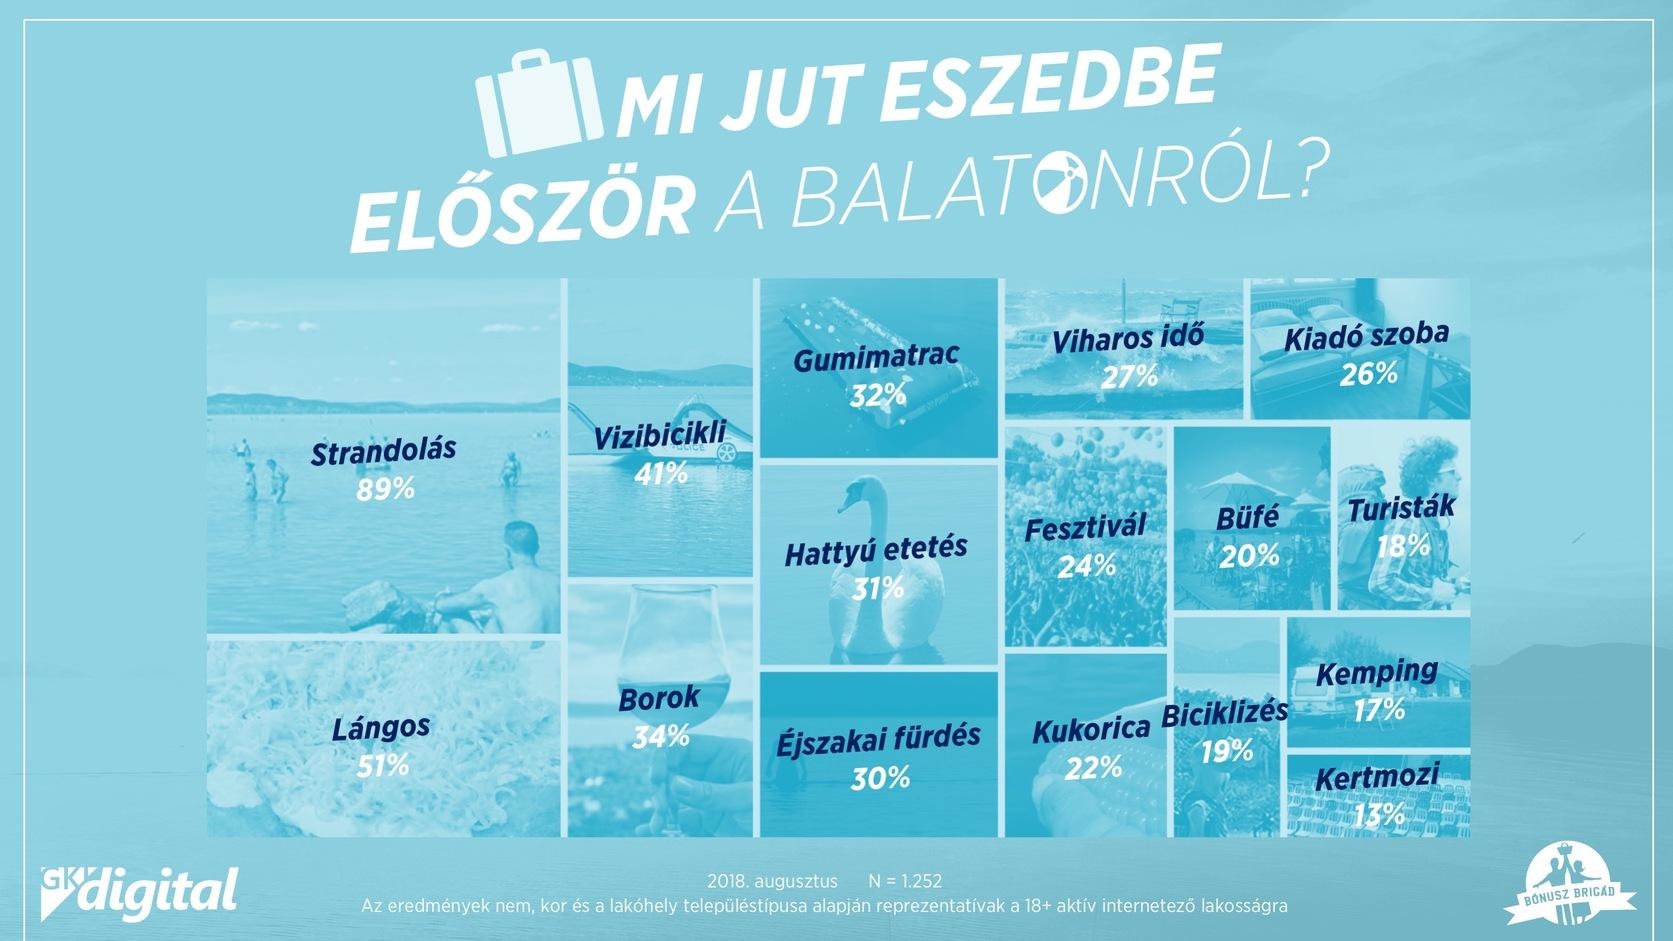 BB-GKID_Balaton_0001 (1)